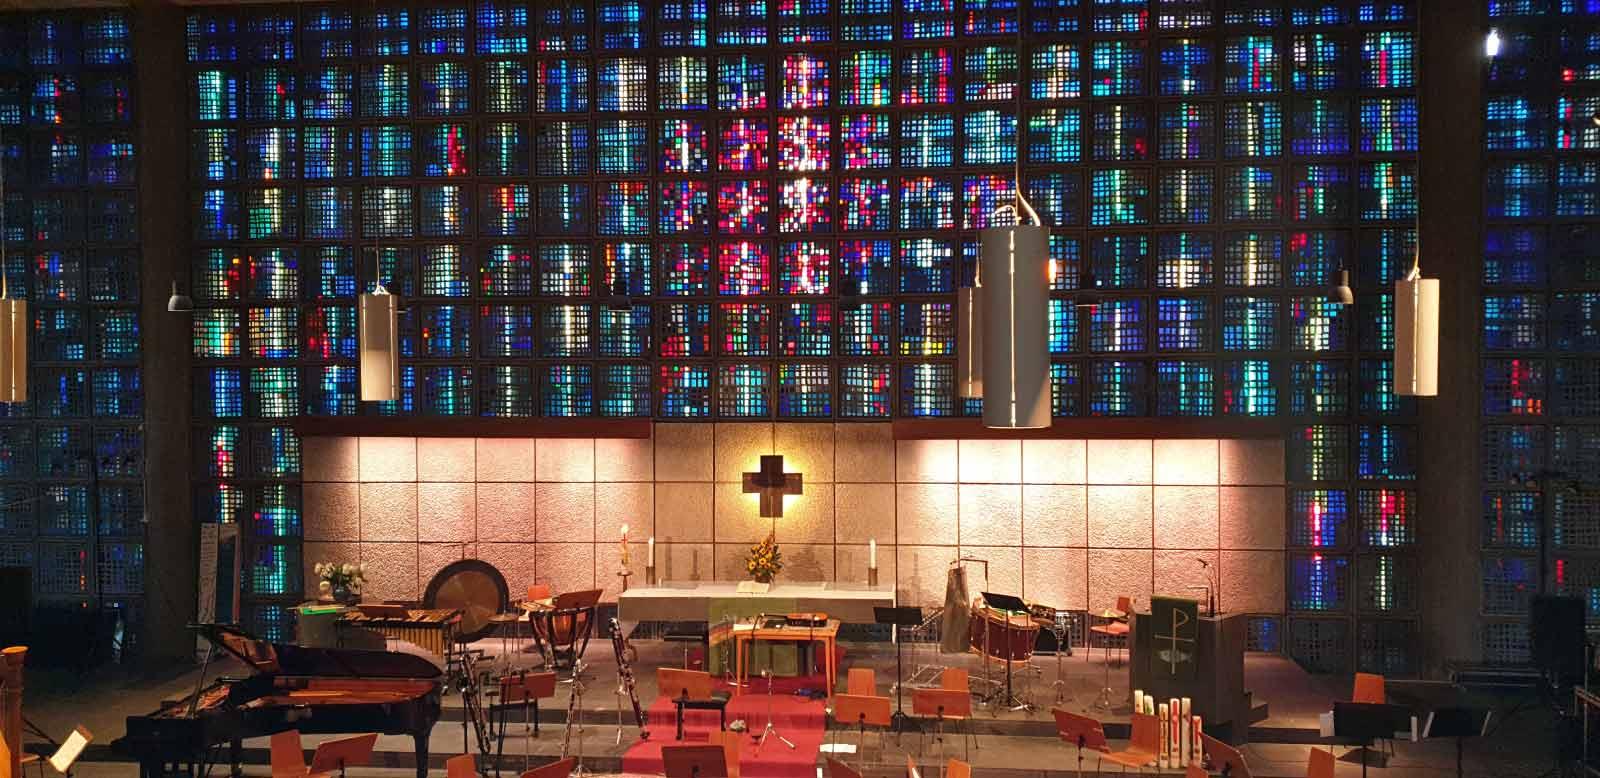 epiphaniaskirche mannheim